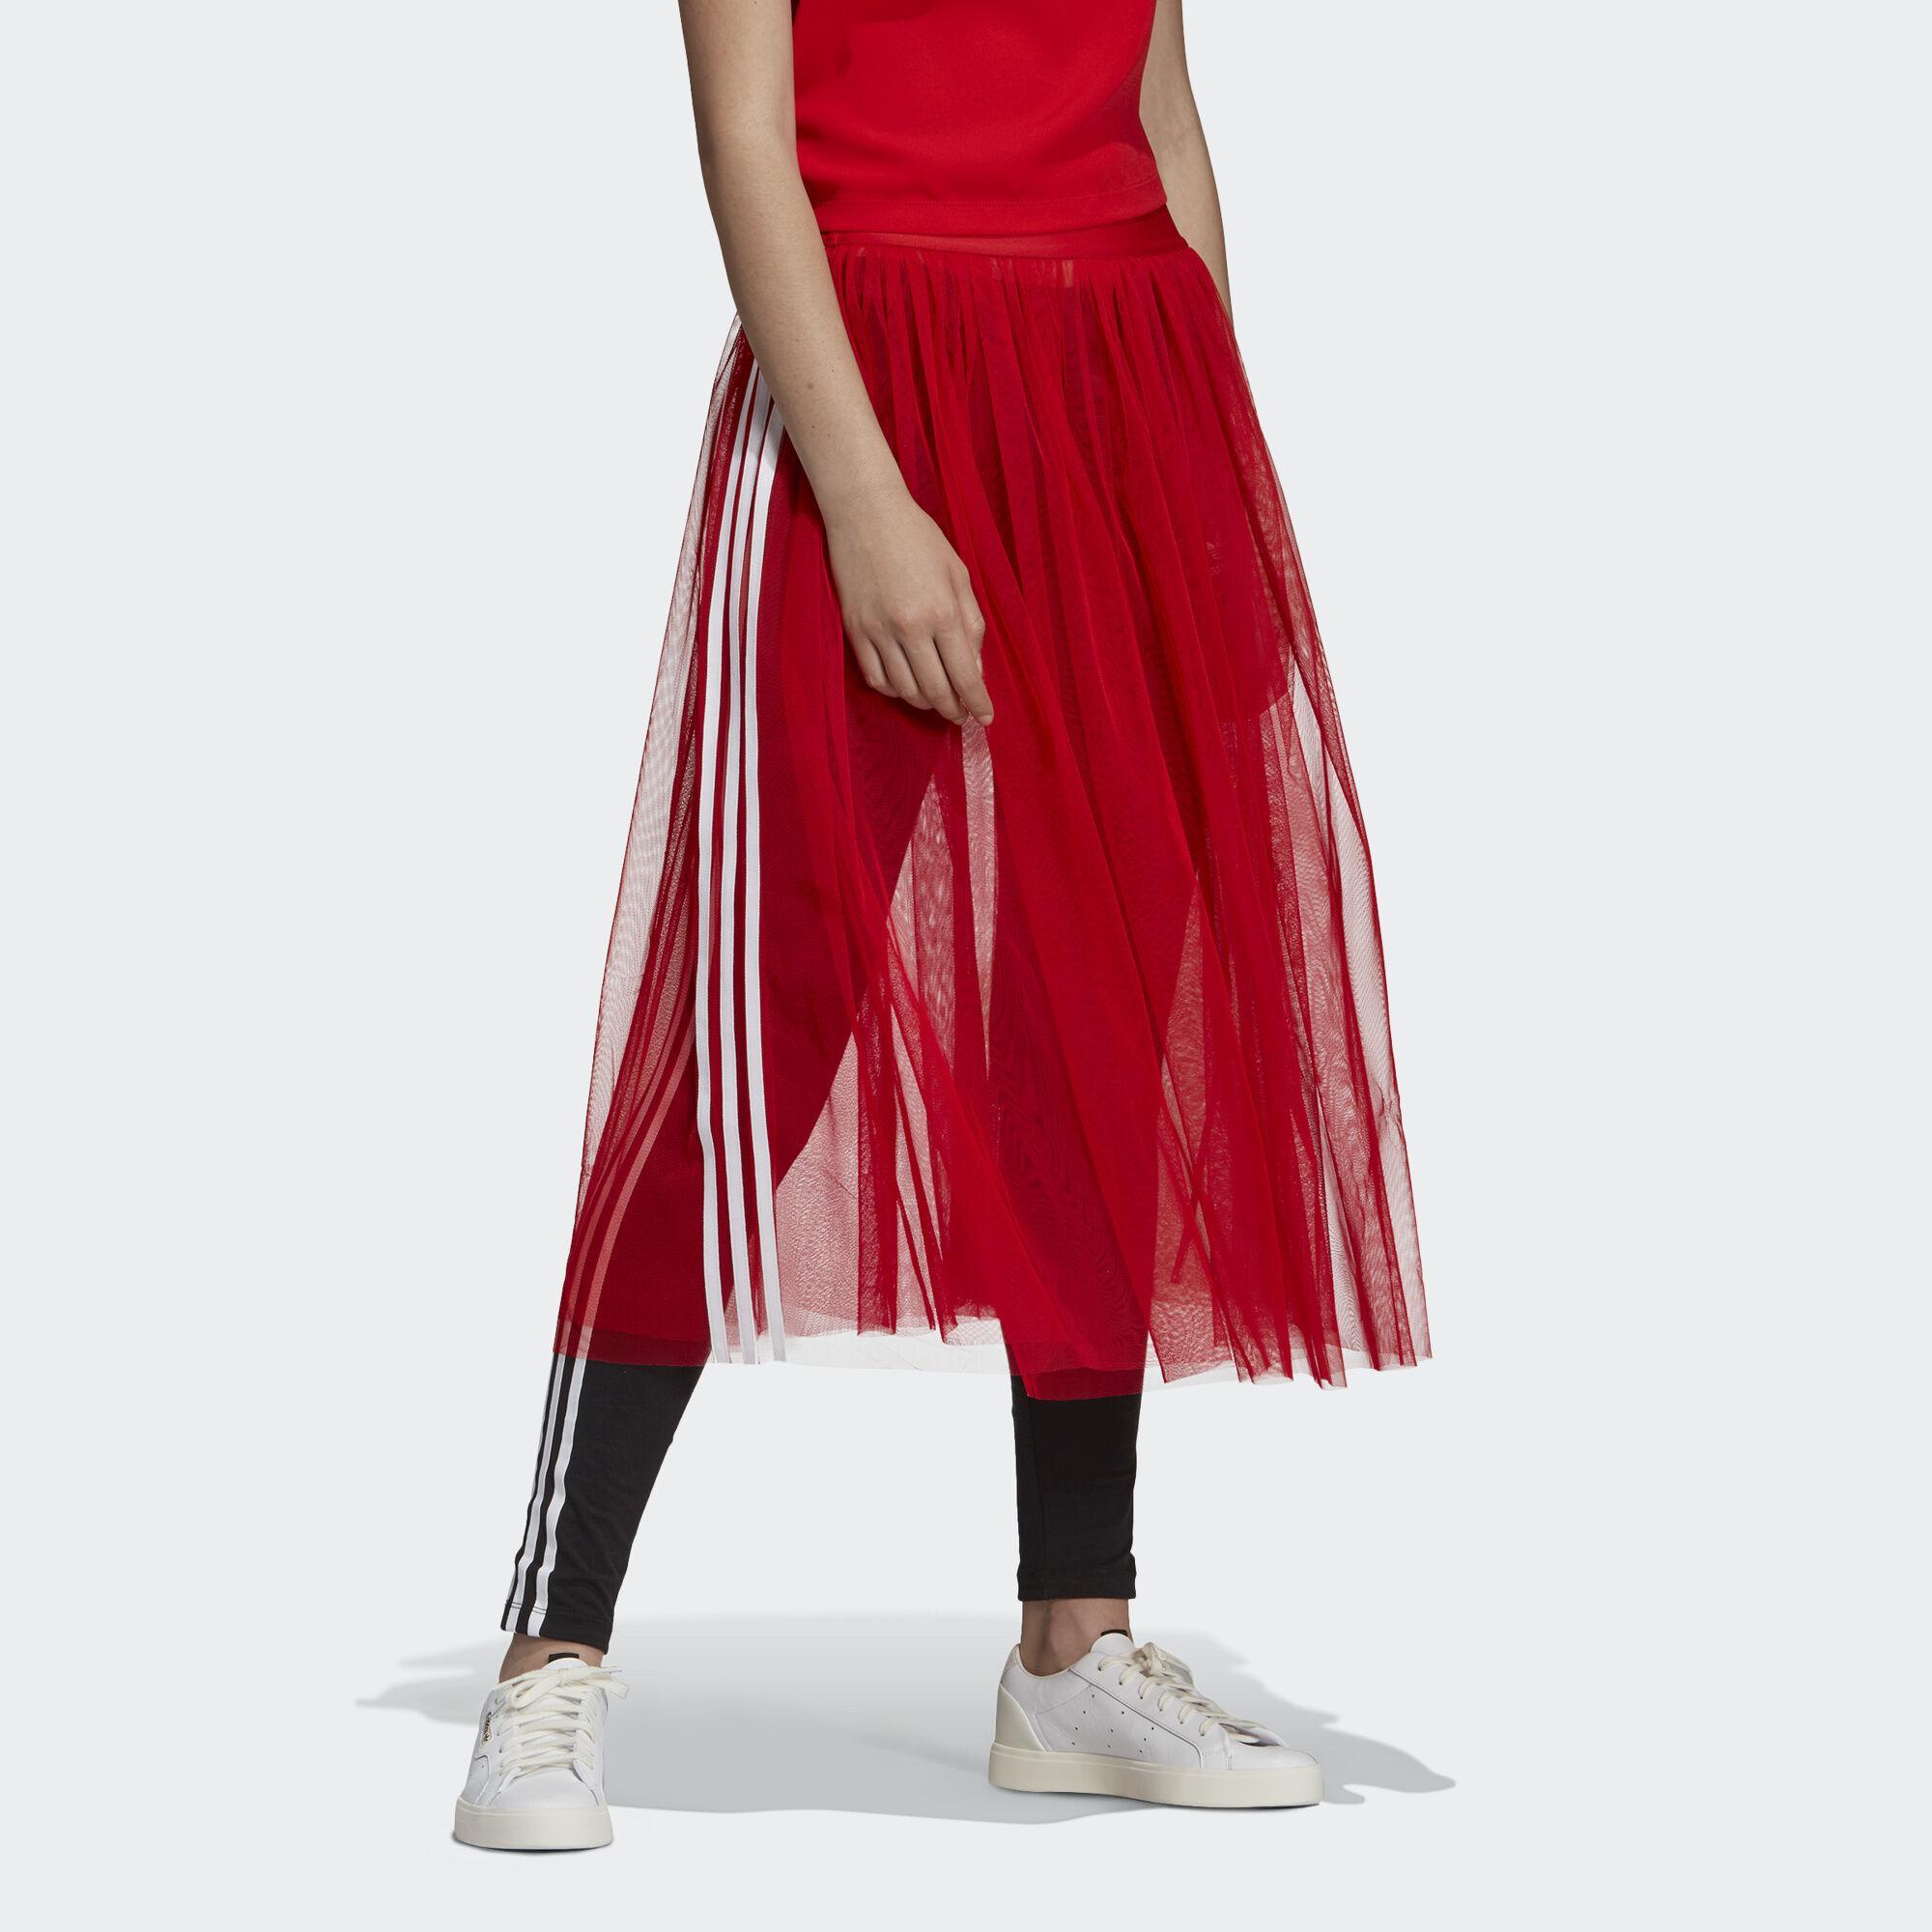 c9e606434 Falda Tulle adidas de color Rojo - Lyst